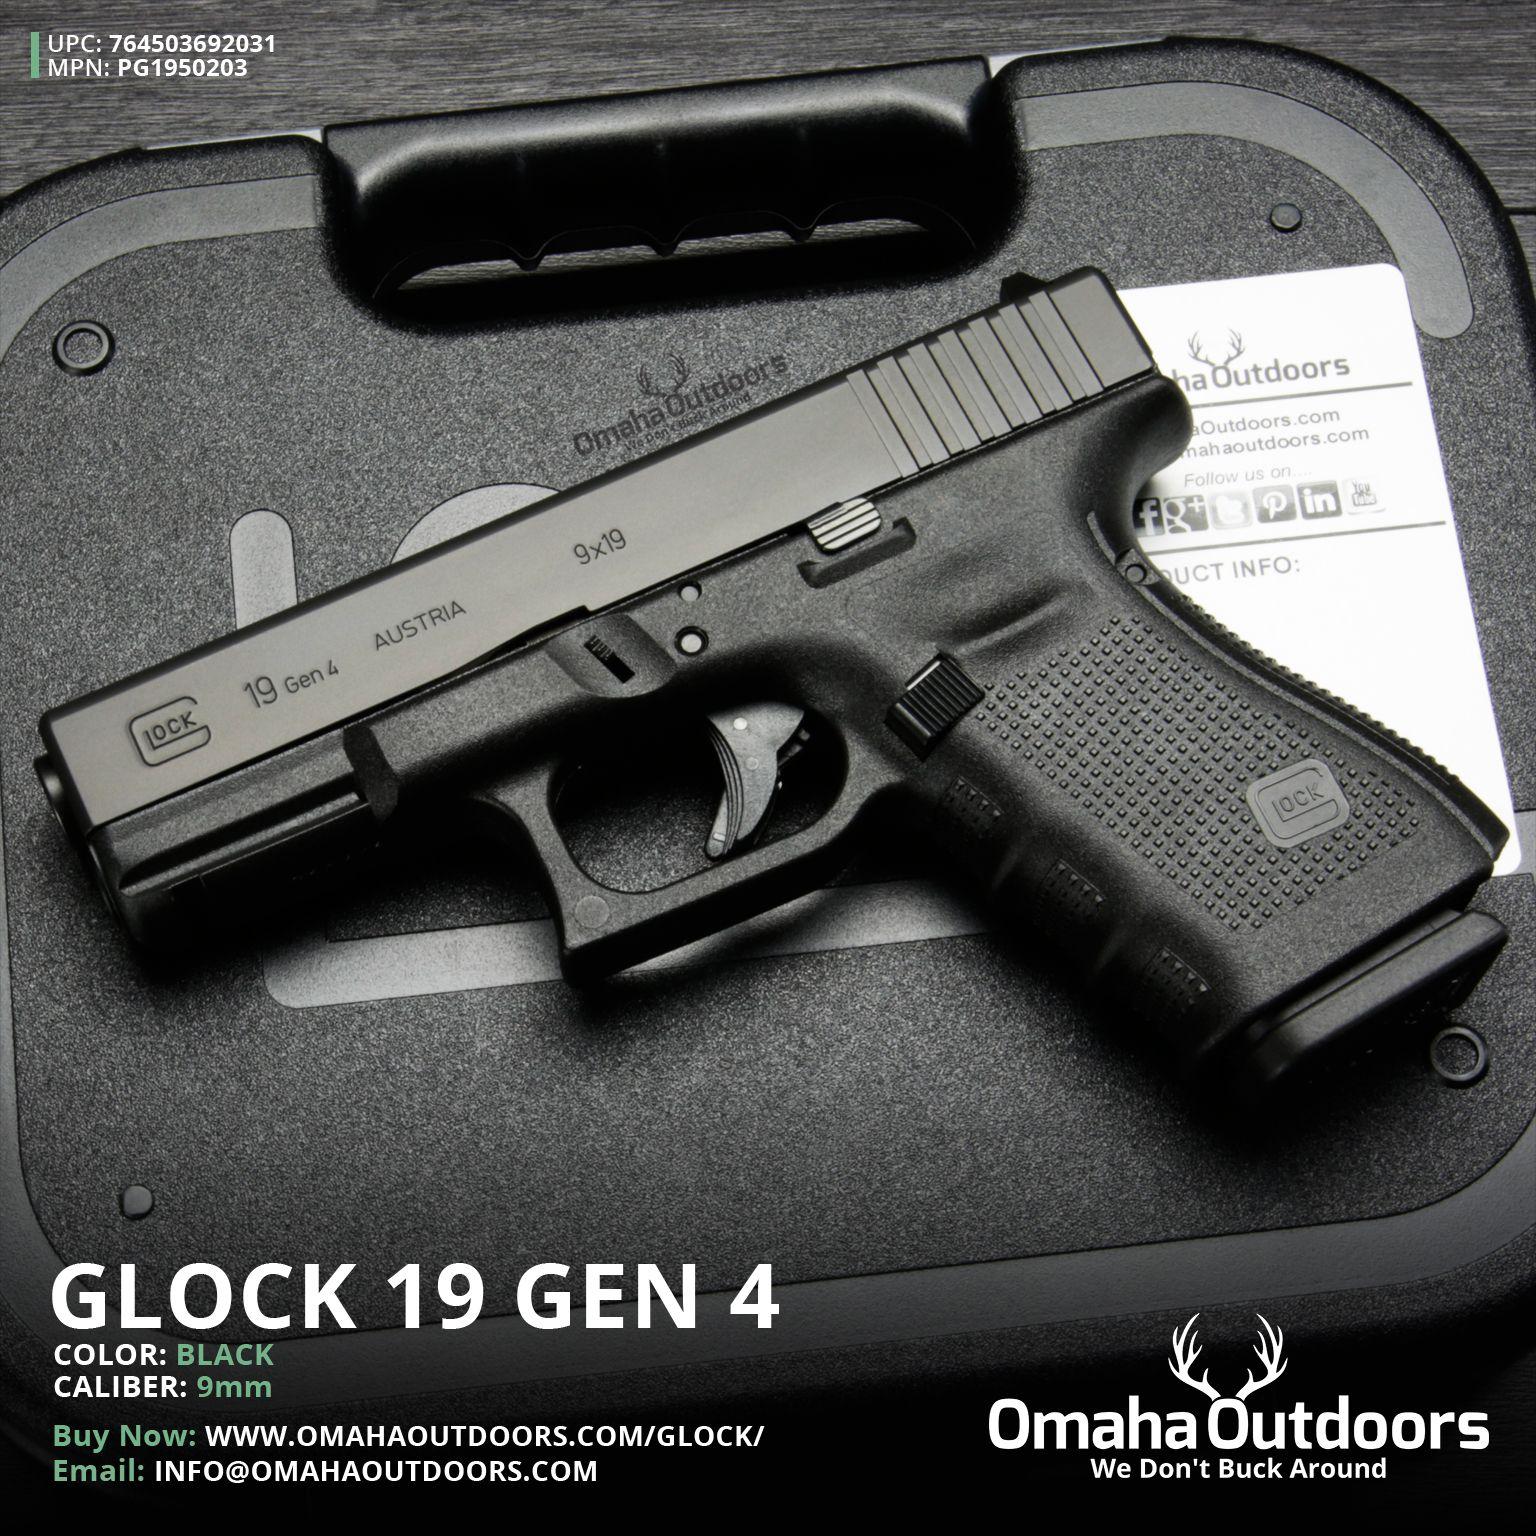 Glock 19 Gen 4 9mm 15 RDS 4.02″ Handgun - Omaha Outdoors | Wish List ...